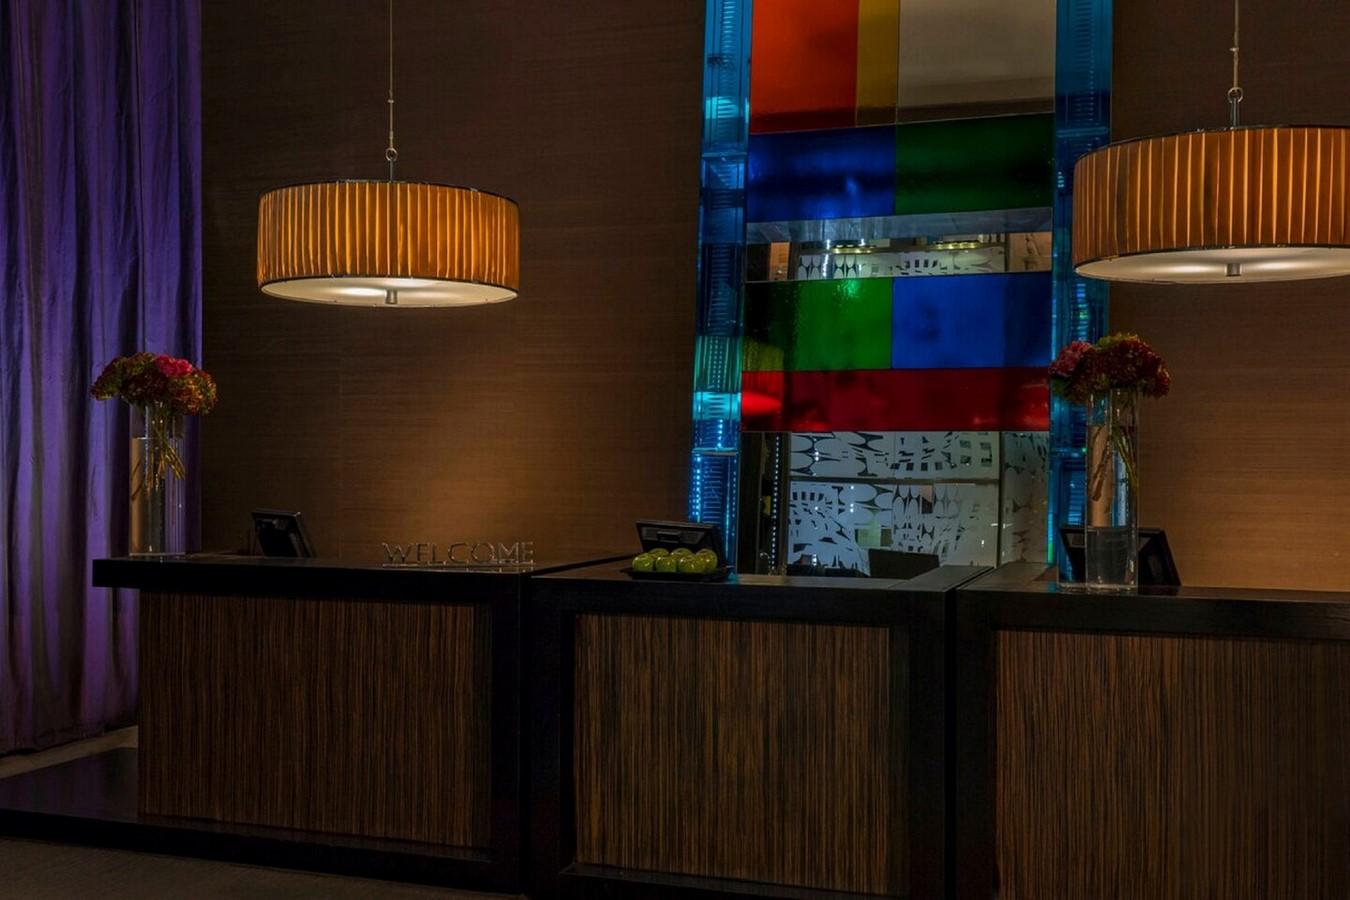 W Hotel, Santiago - Sheet2